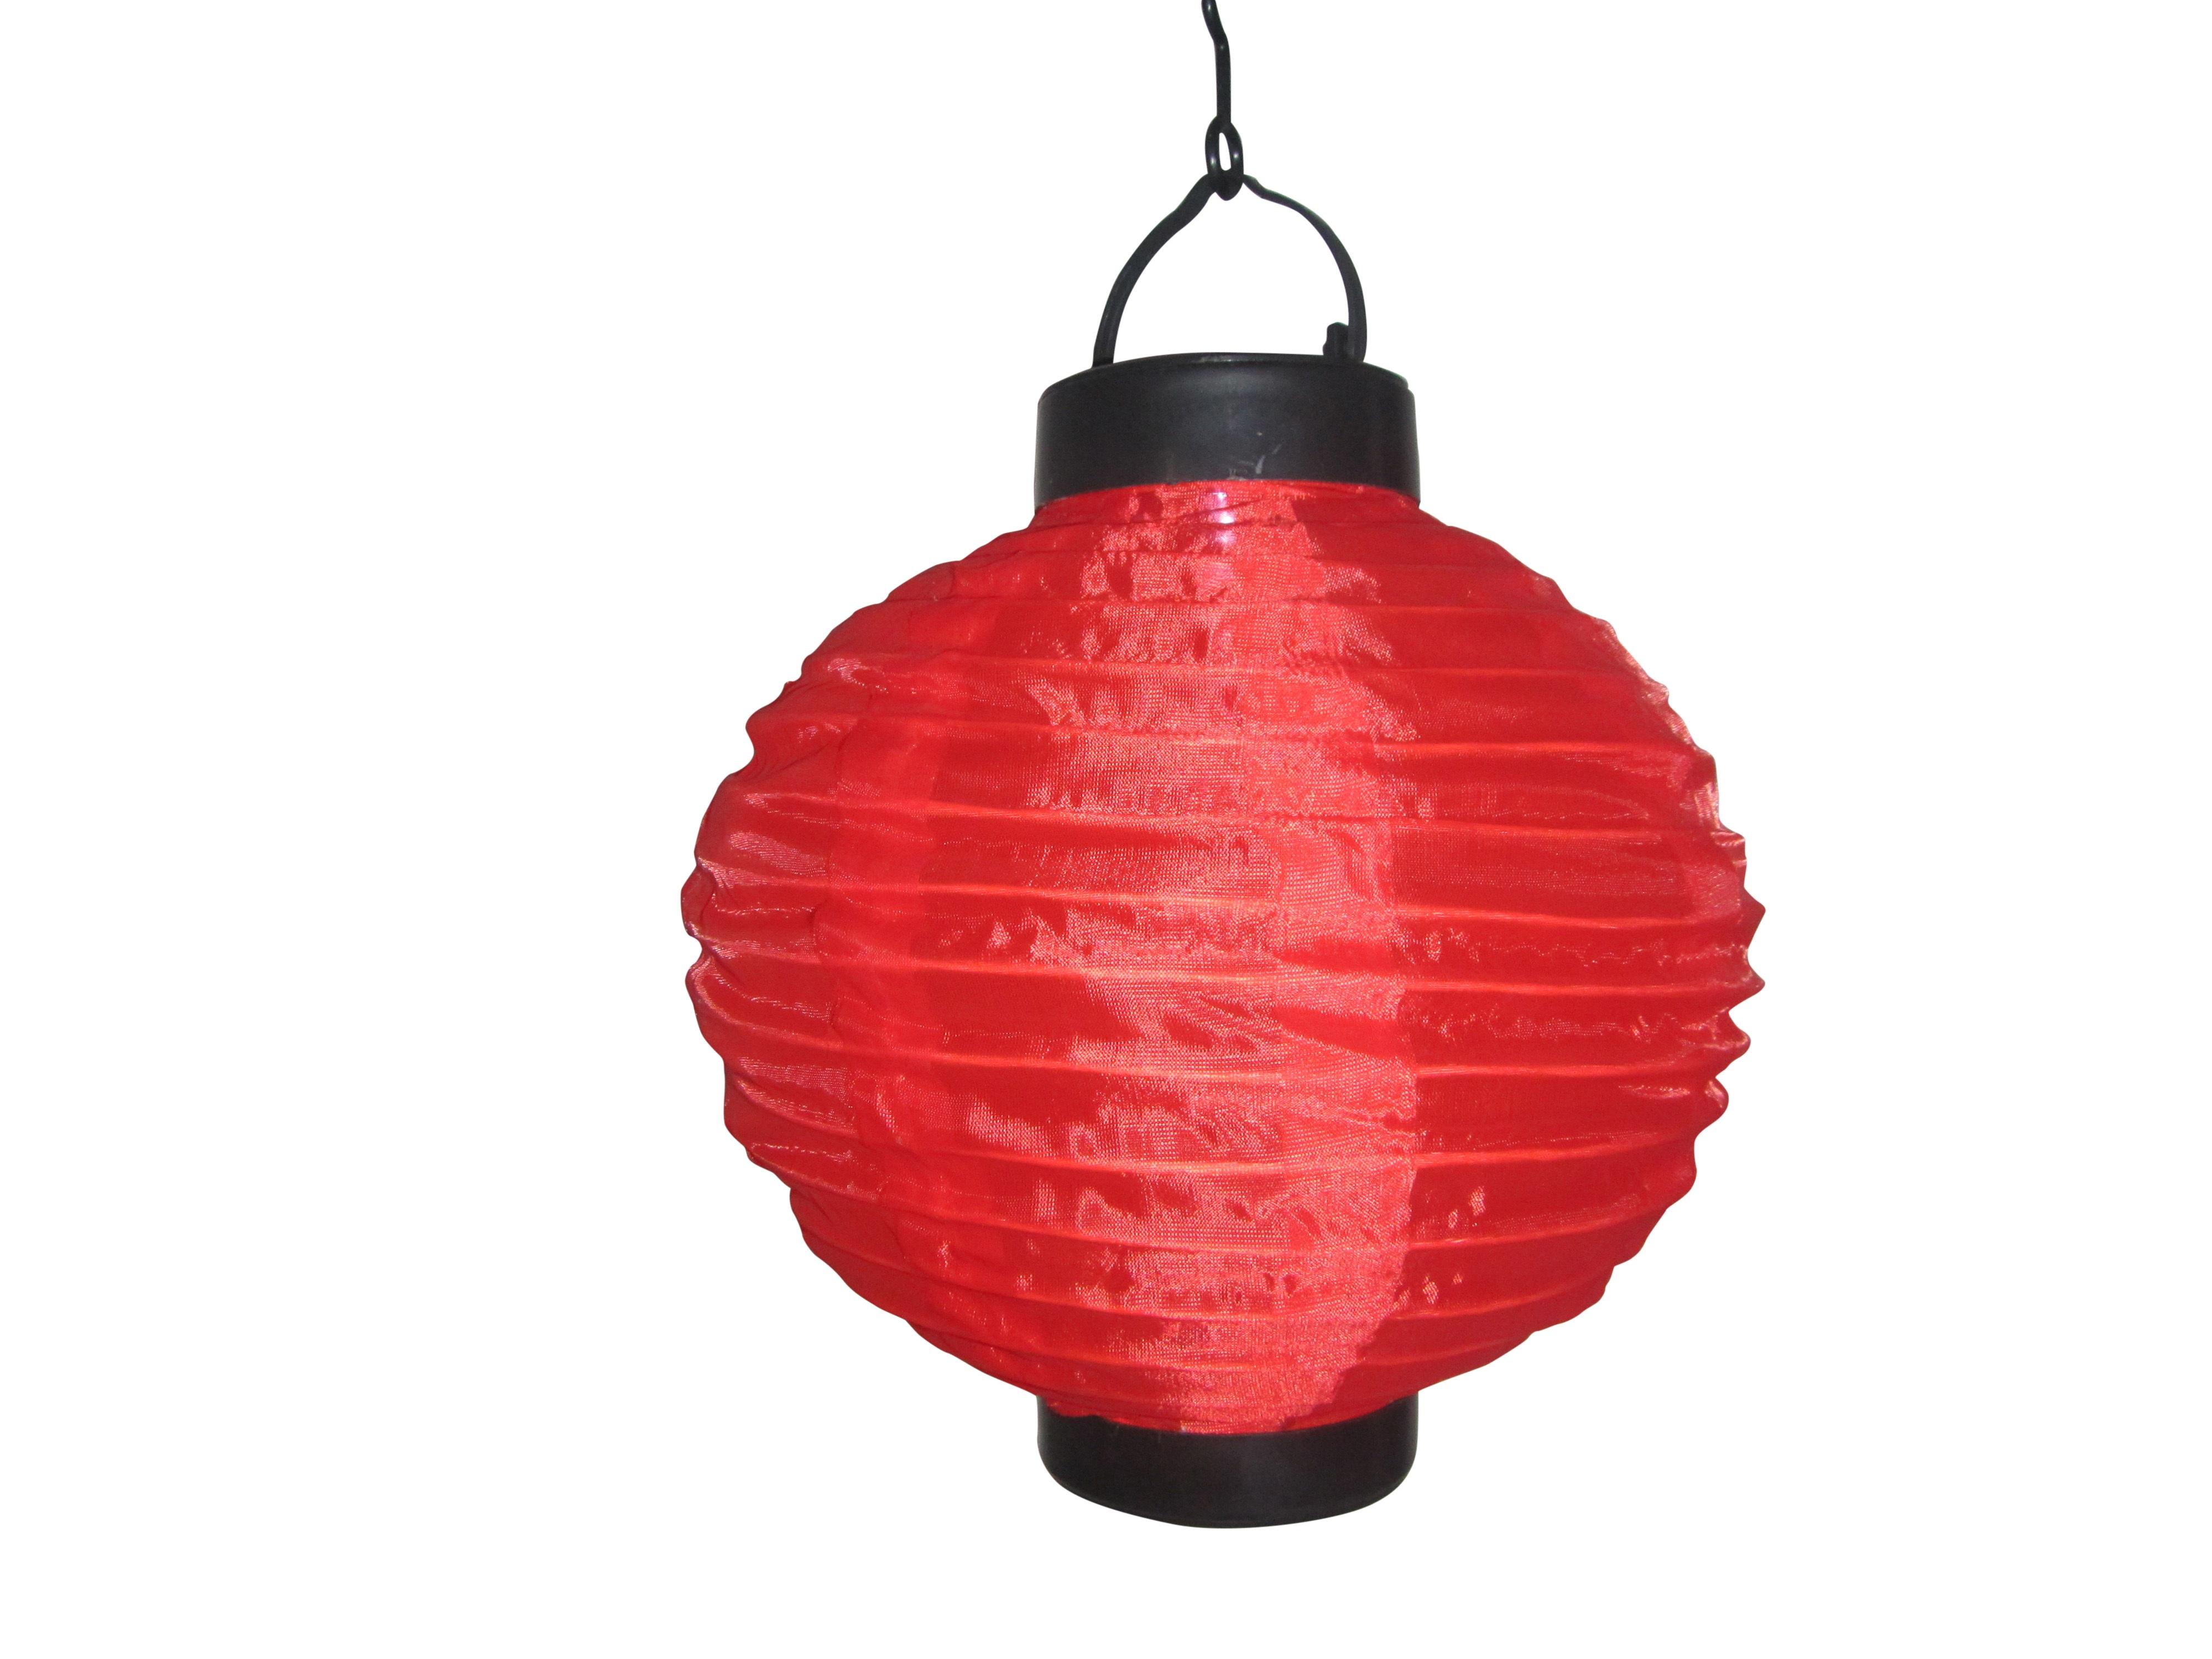 Celebration Lantern Red Lamp Lighting Decor Product Light Fixture Lighting  Box Red Light Box